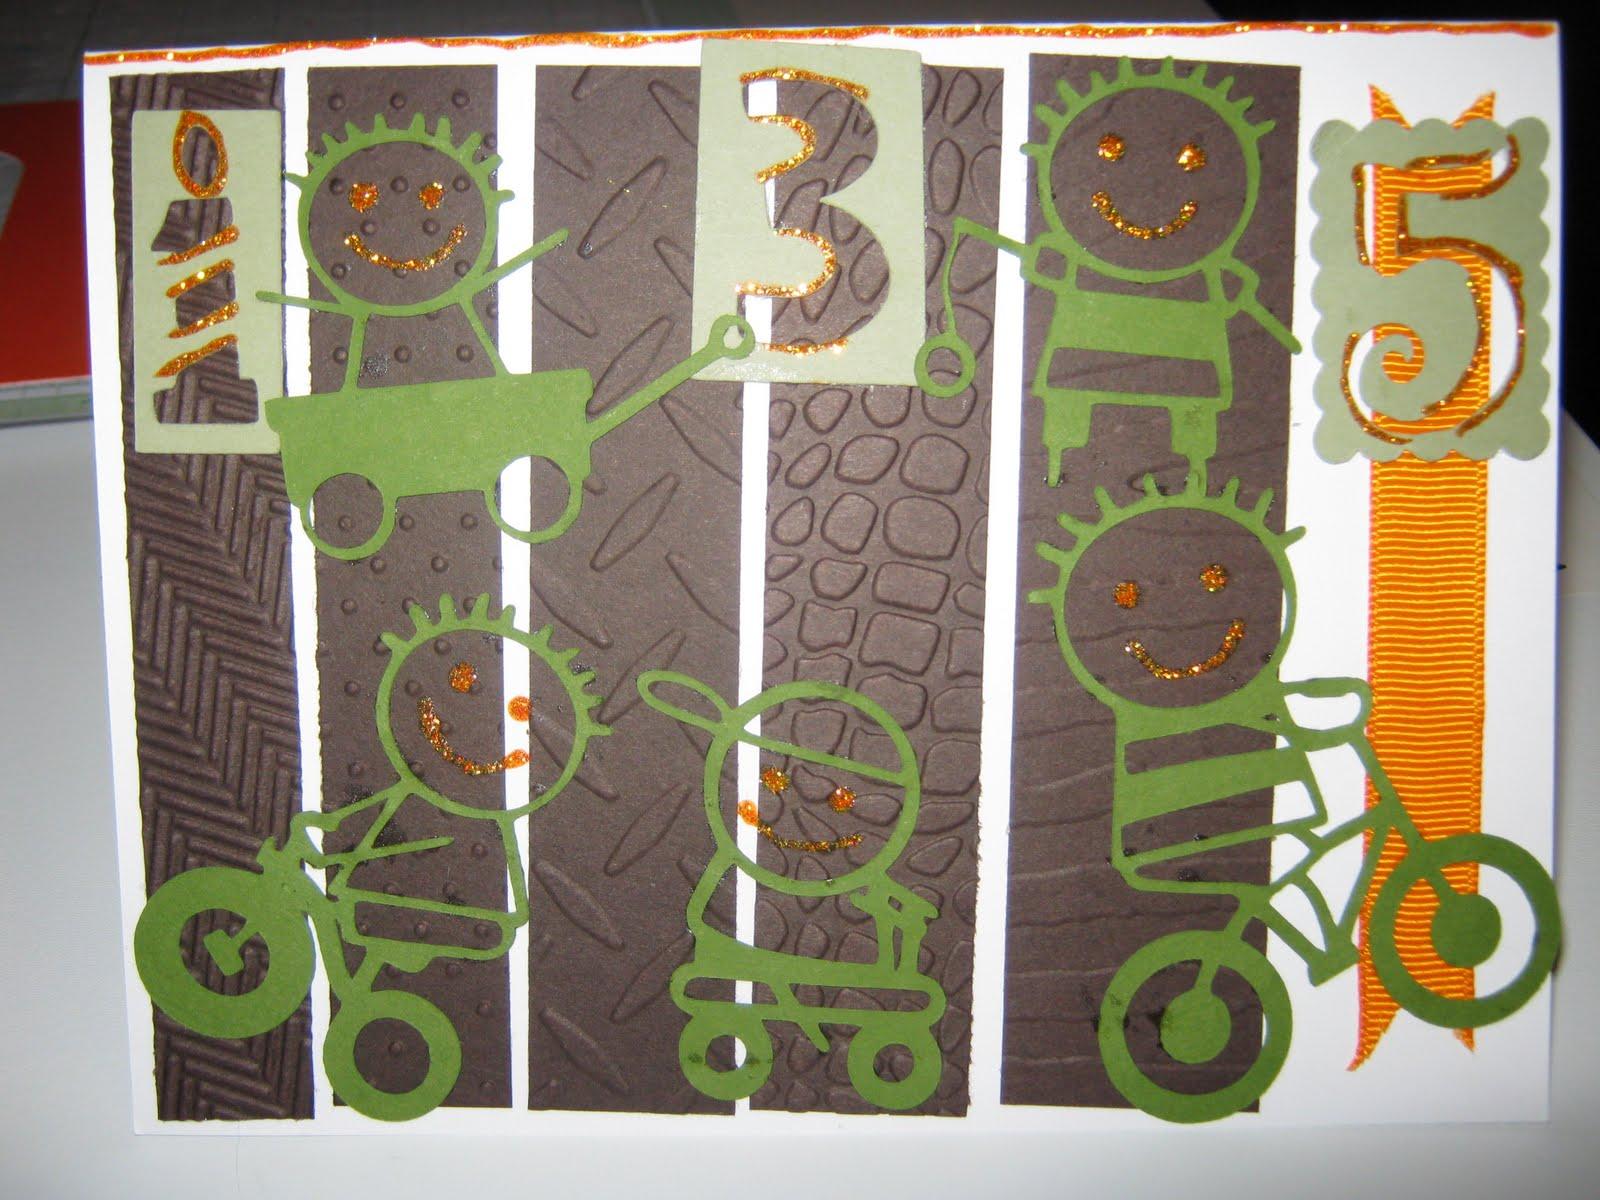 http://4.bp.blogspot.com/-LxnQ0uJMgzs/TXFeGABQh3I/AAAAAAAAAdI/iKmRBrv47GM/s1600/birthday%2Bcard%2B002.JPG